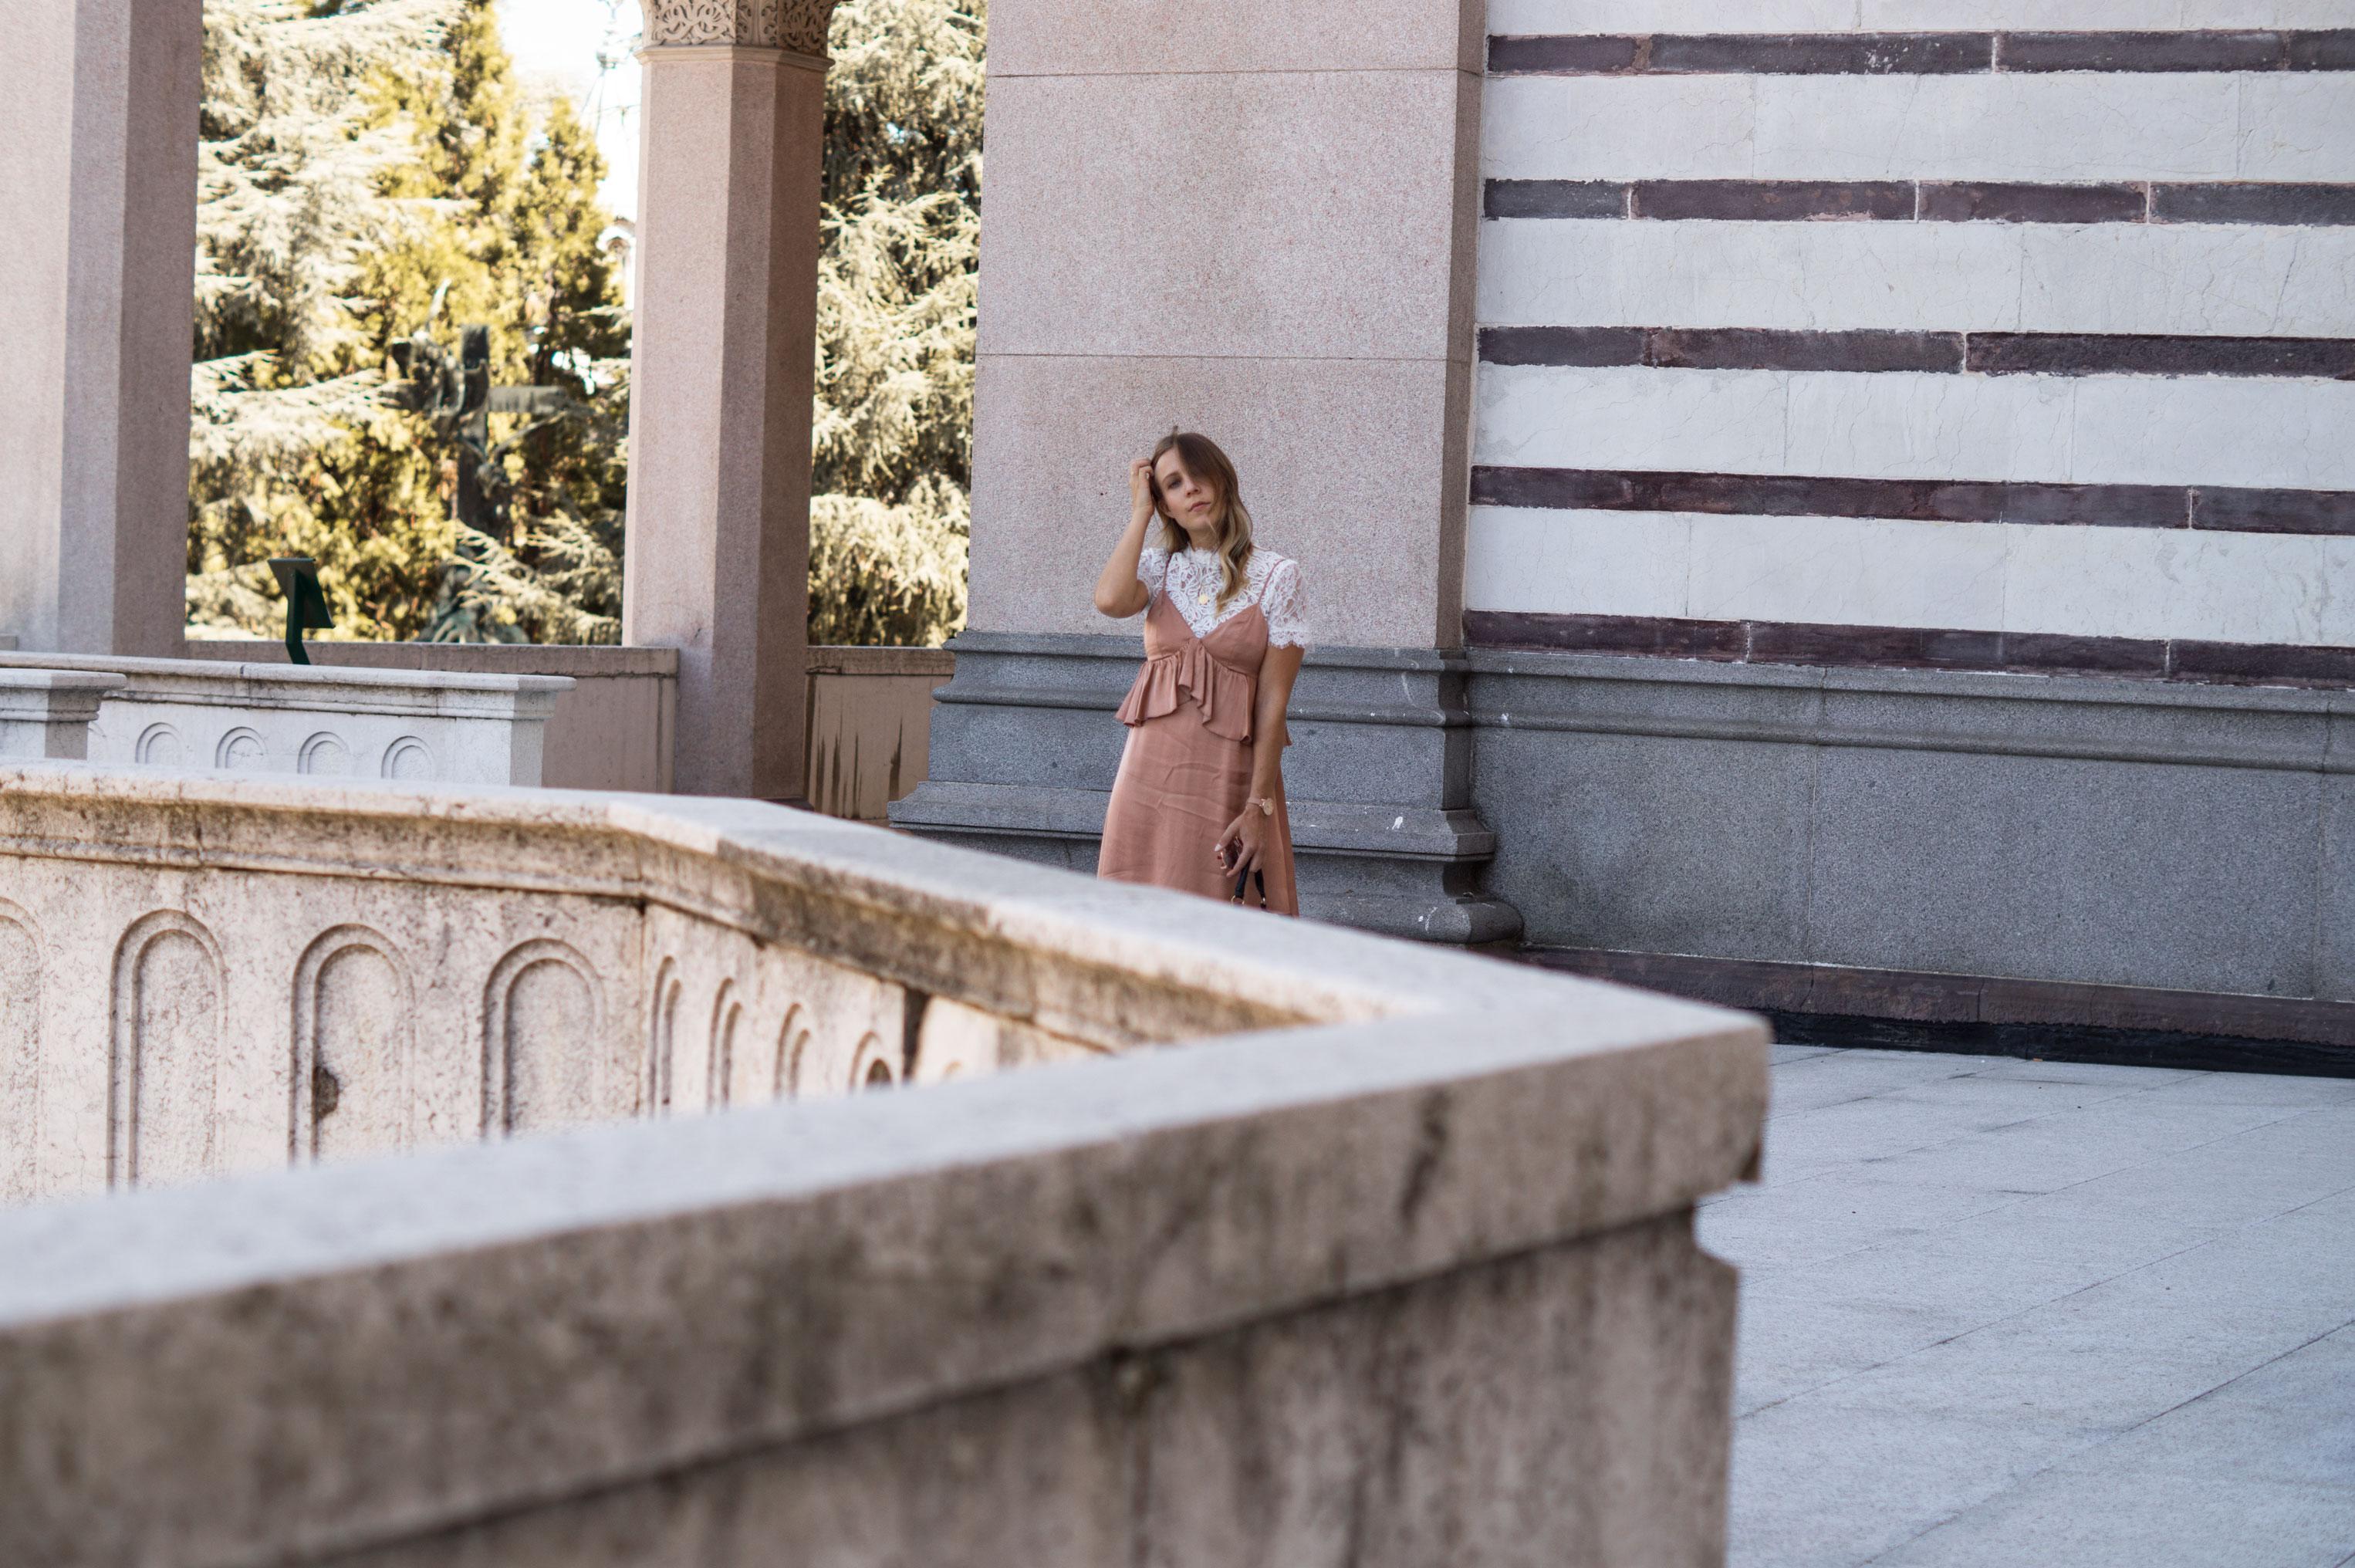 Copper Slipdress rosa Satinkleid silk dress ruffles Rüschenkleid H&M Sariety Modeblog Heidelberg Fashionblogger Milan Mailand Shooting-20